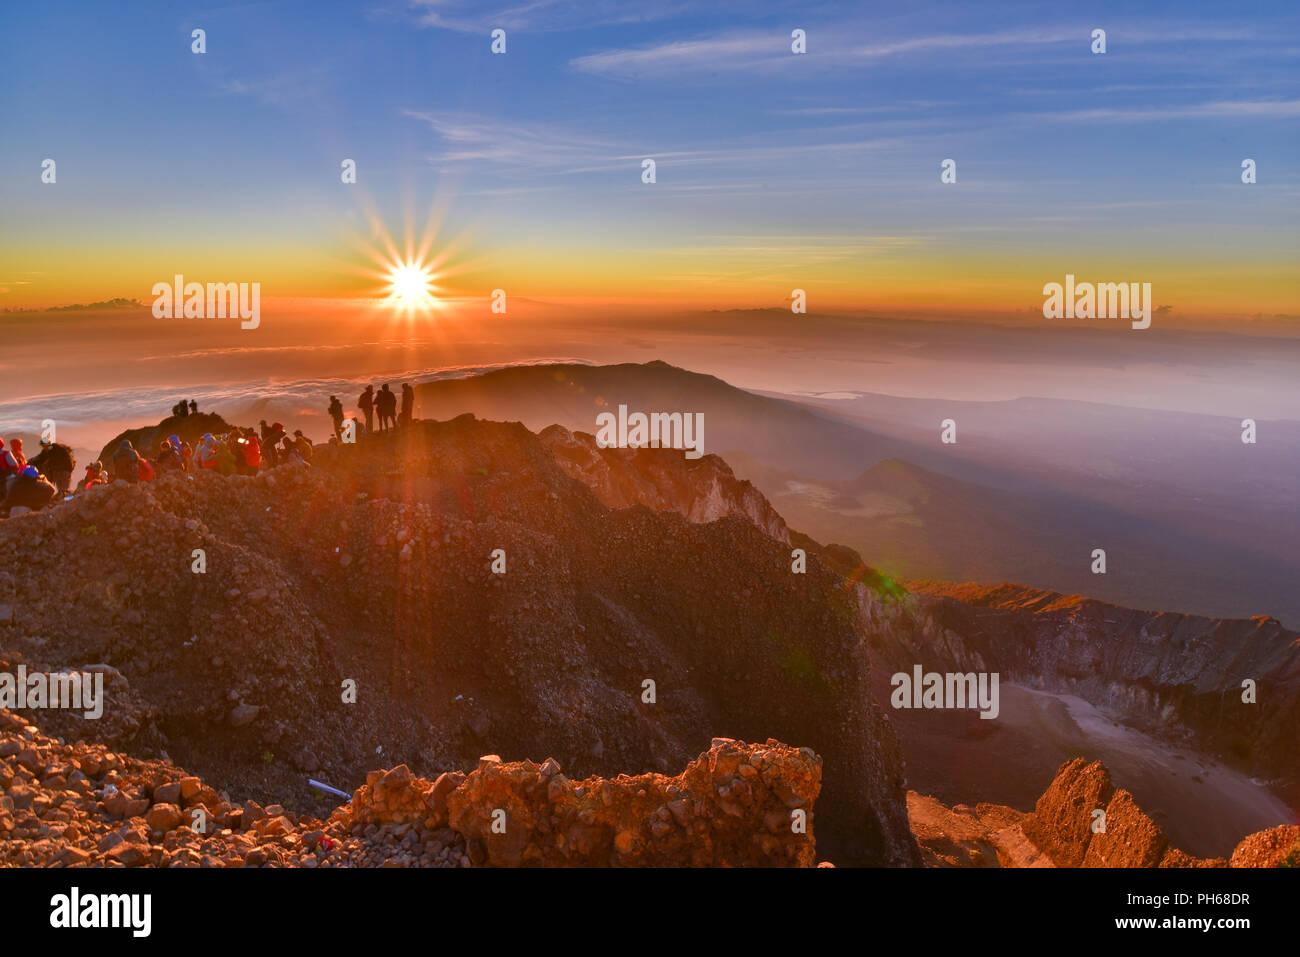 Die Menschen auf dem Gipfel des Vulkan Rinjani Sonnenaufgang beobachten, Lombok, Indonesien Stockbild